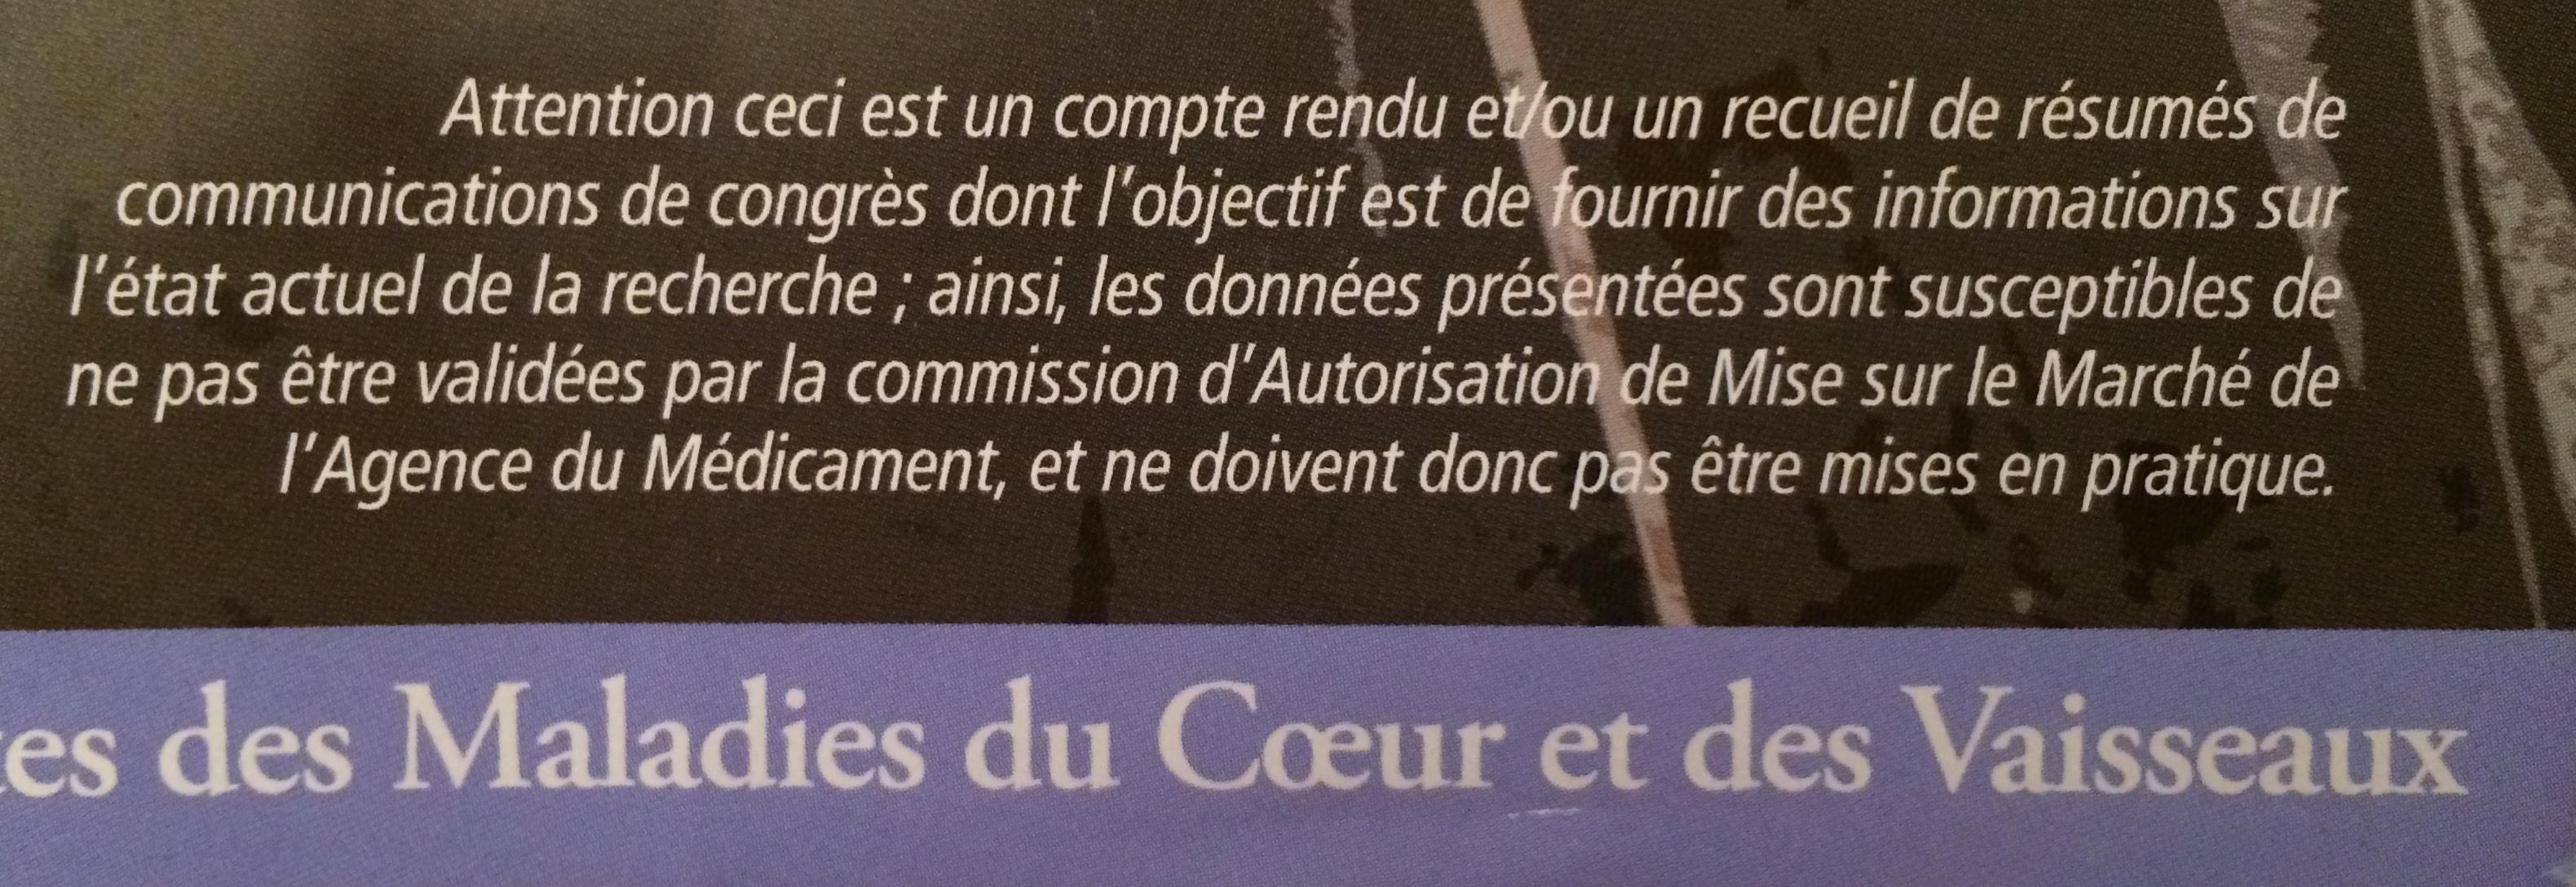 rencontres prescrire 2014 Saint-Laurent-du-Maroni